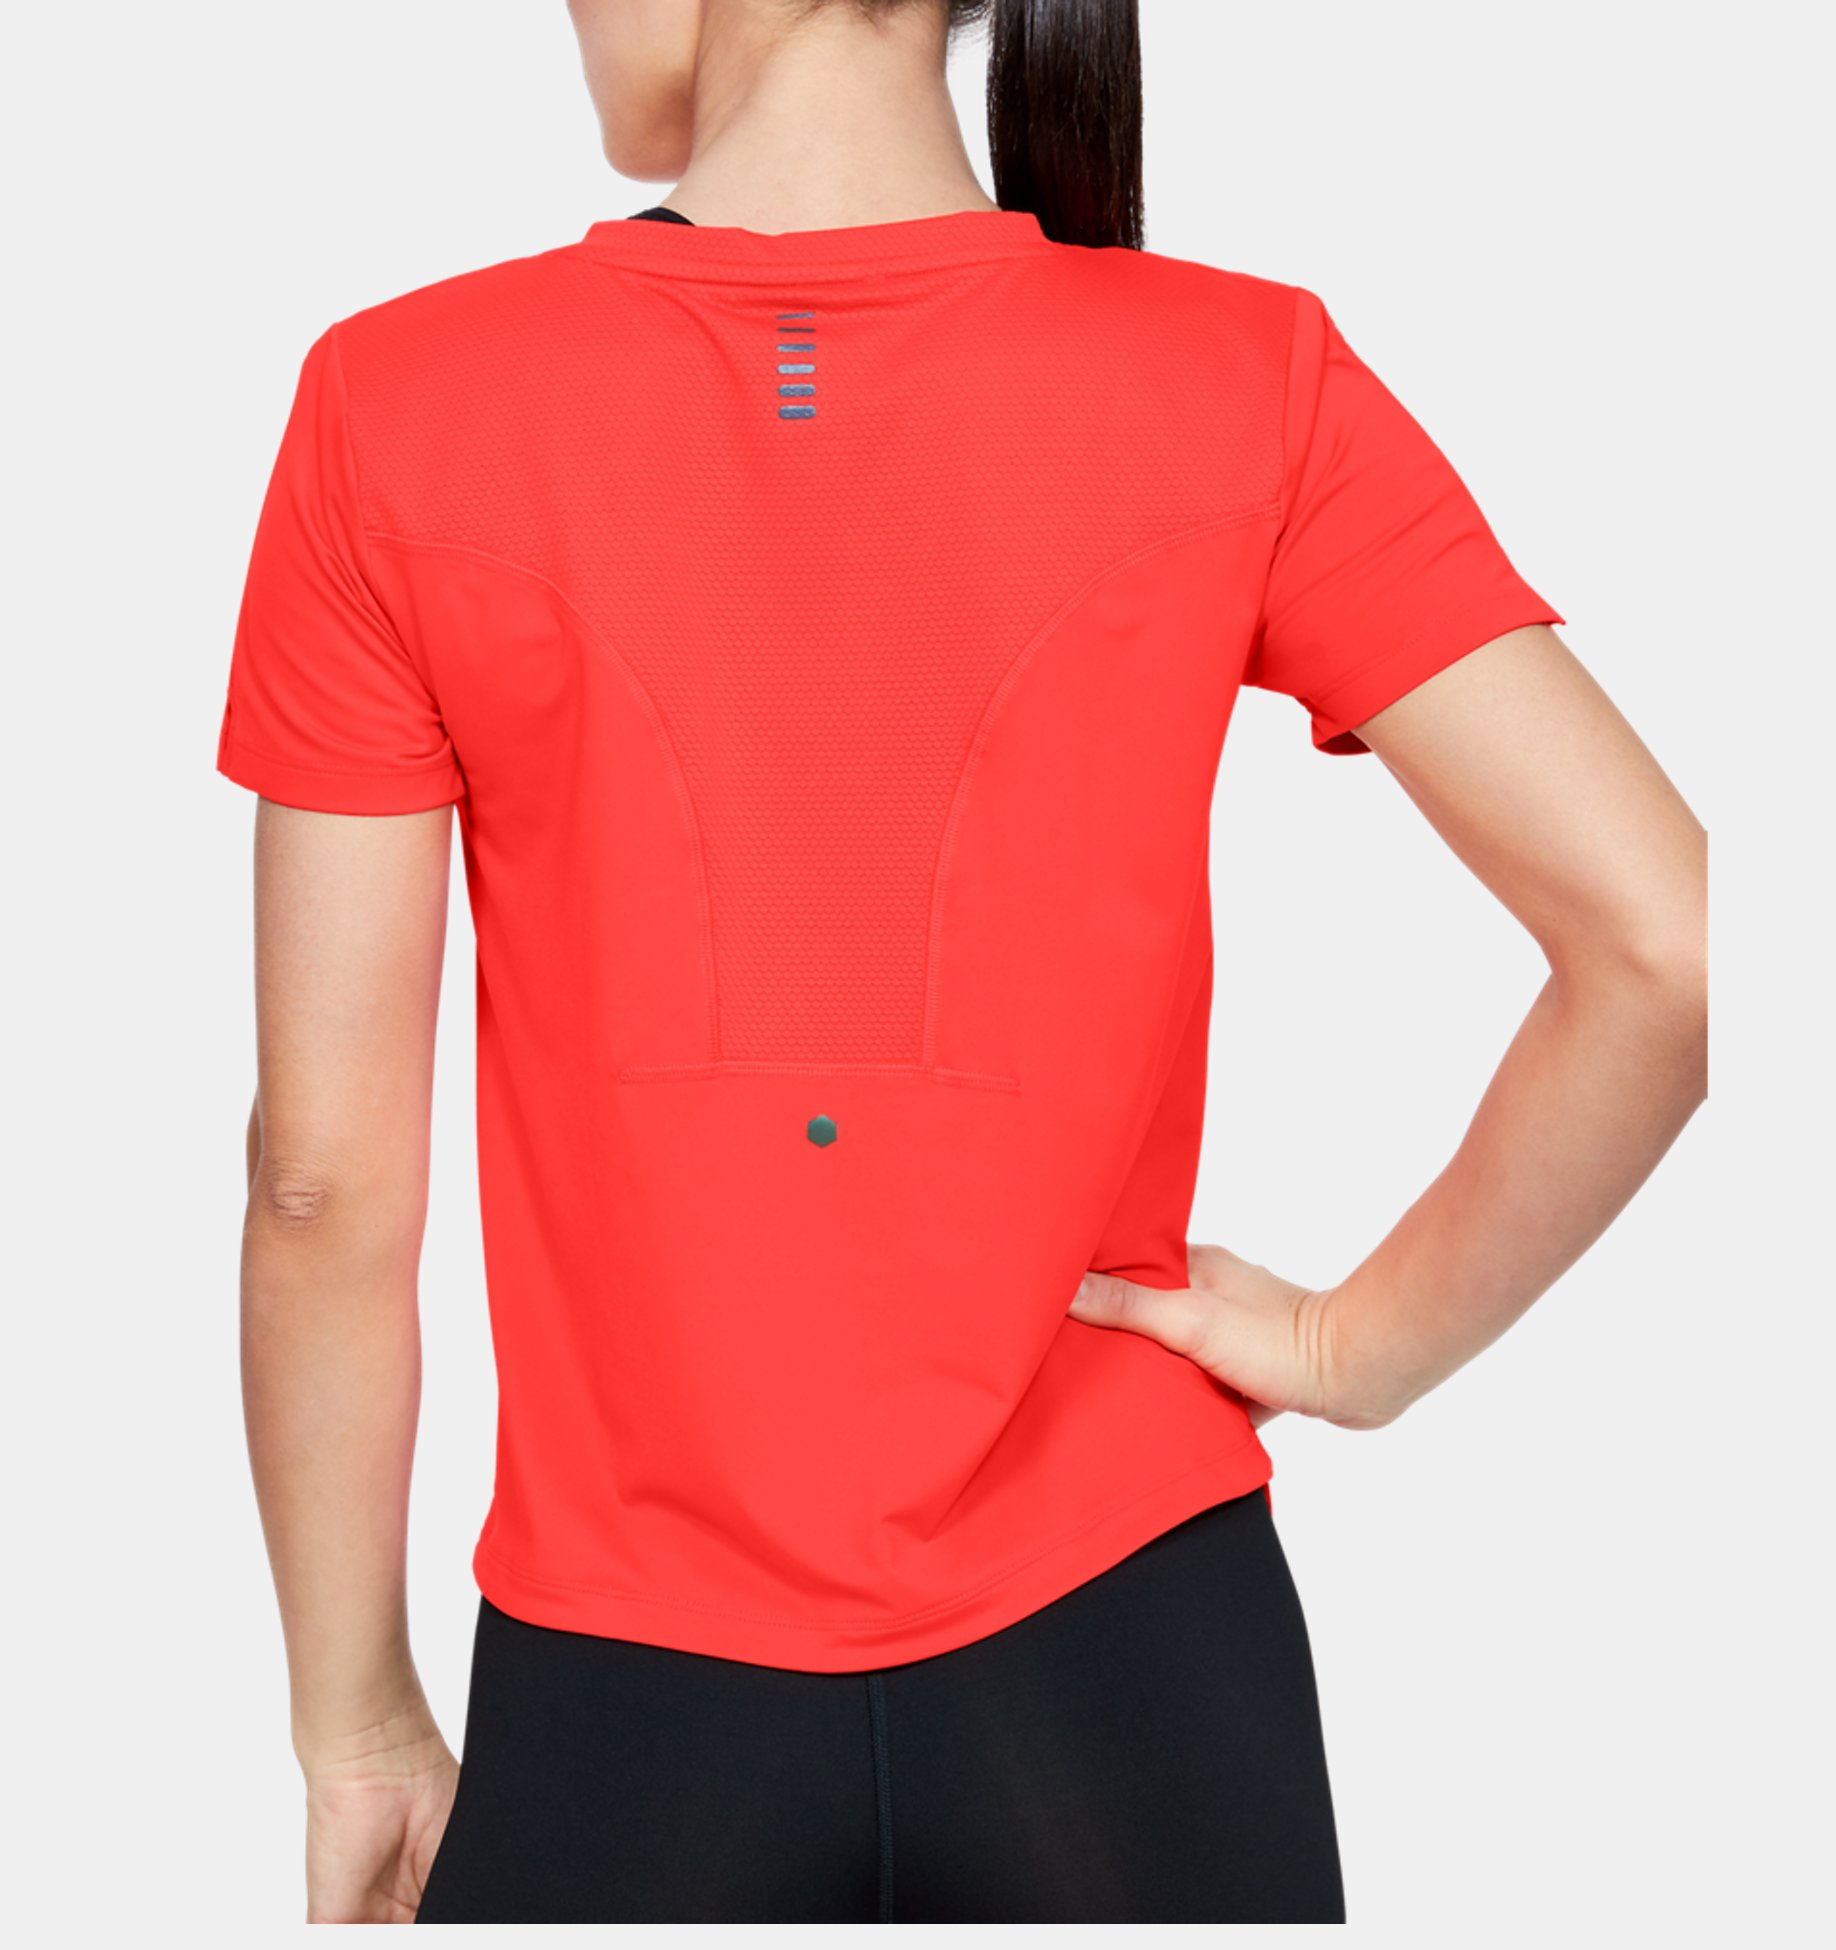 mode designer 12c85 5e2b7 T-shirt à manches courtes UA RUSH Run HeatGear® pour femme ...